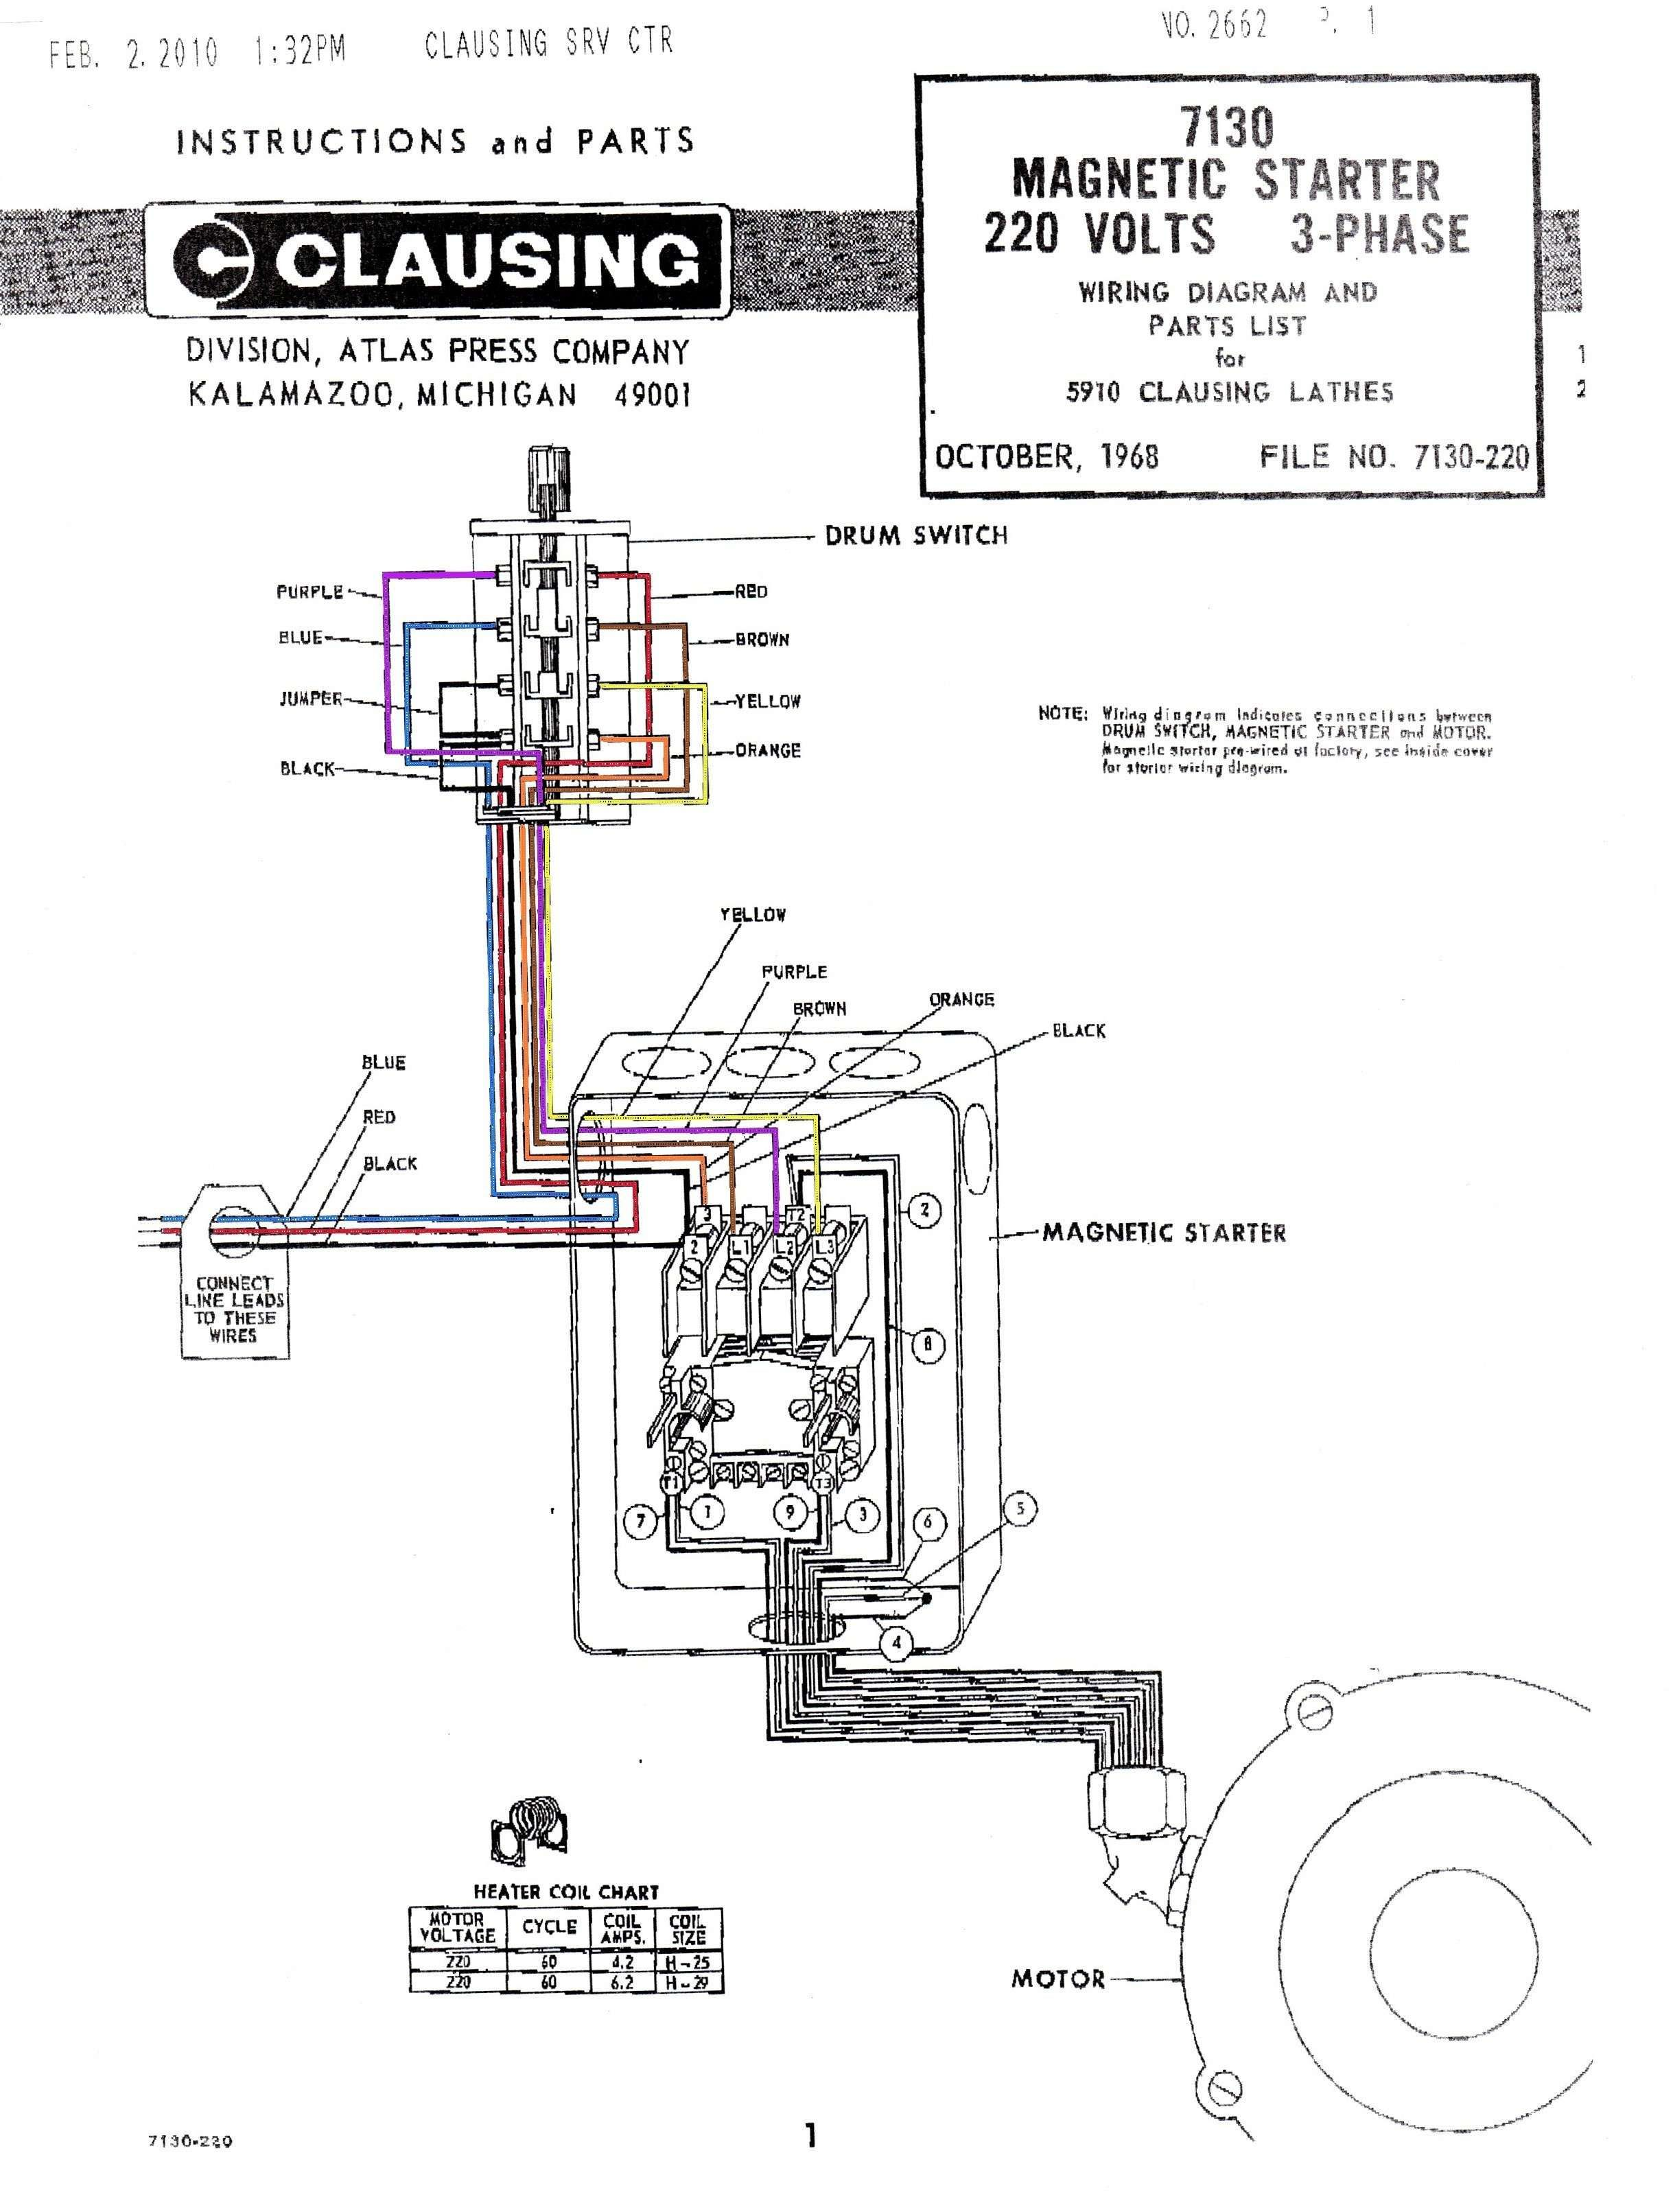 Wiring Diagram Bathroom Lovely Wiring Diagram Bathroom Bathroom Fan Light Wiring Diagram Mikulskilawoffices Diagram Wire Circuit Diagram